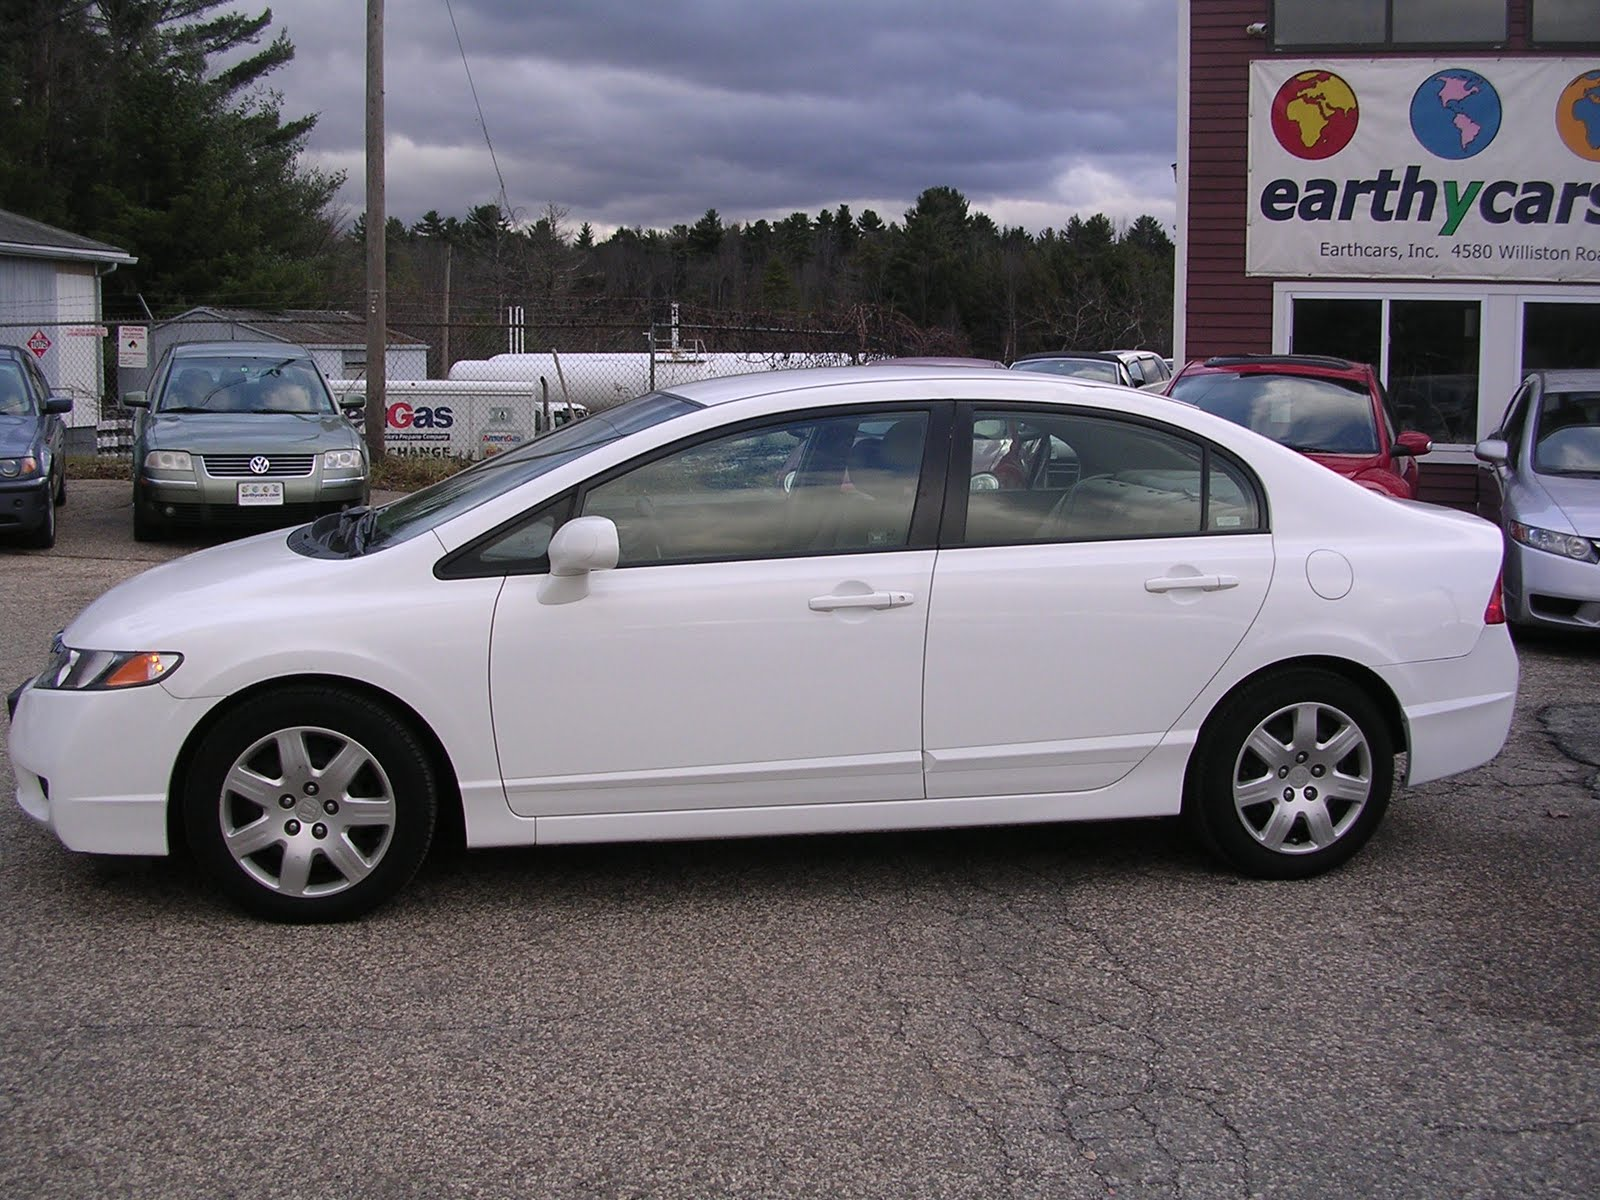 2009 Honda Civic LX, Sedan, Silver, 14834 Mi, $13,900 Http://bit.ly/wlgqVM  Compact, 5 Spd Automatic, MPG U003d 25/36